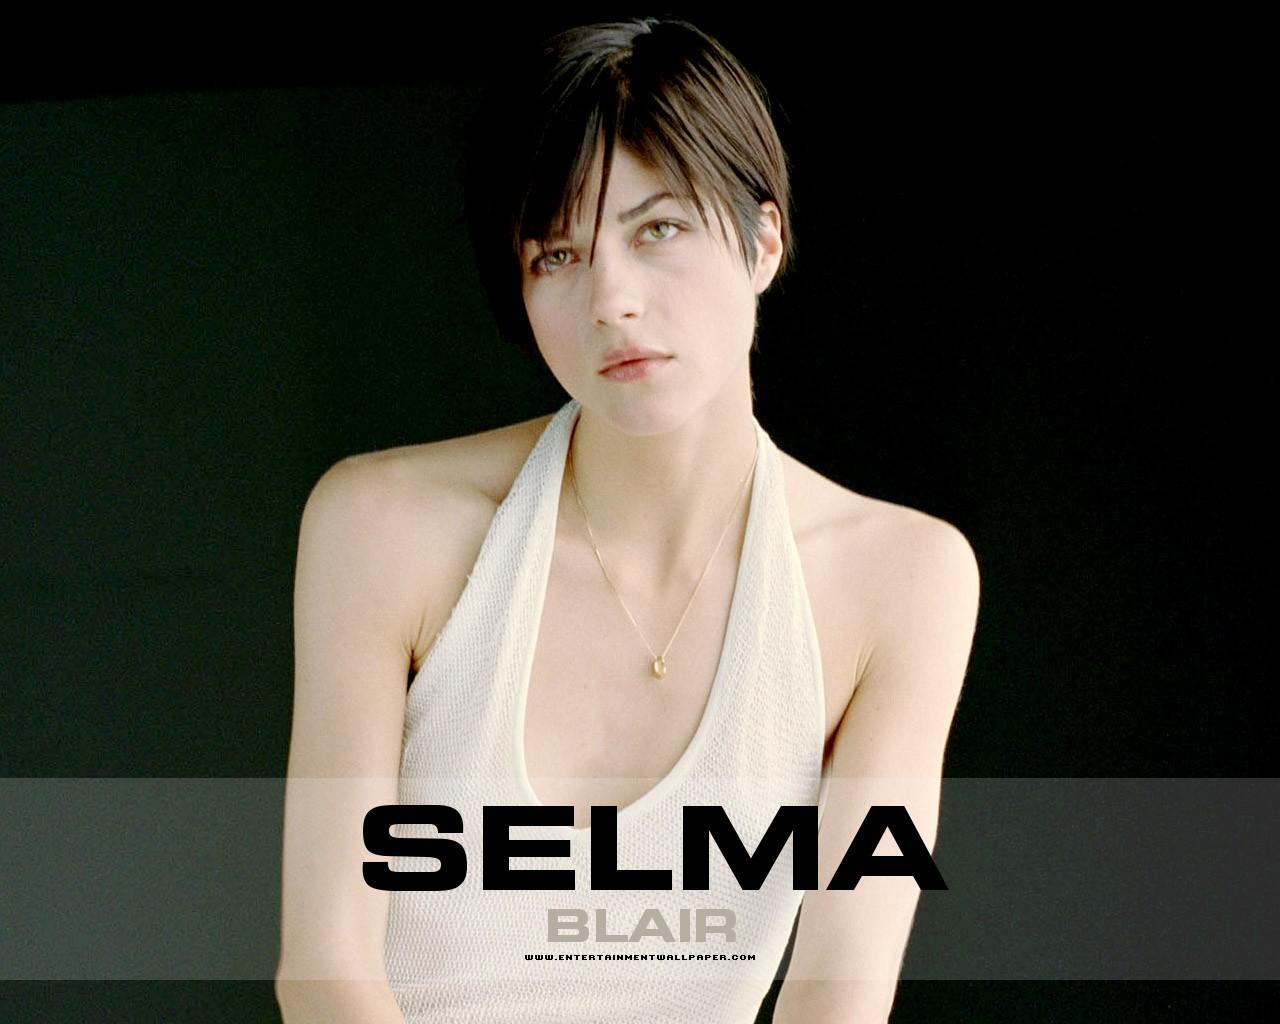 http://4.bp.blogspot.com/-XPMLuf0hLN8/Tr-6qurDv4I/AAAAAAAACoQ/lWMxDWtpdZs/s1600/selma_blair01.jpg